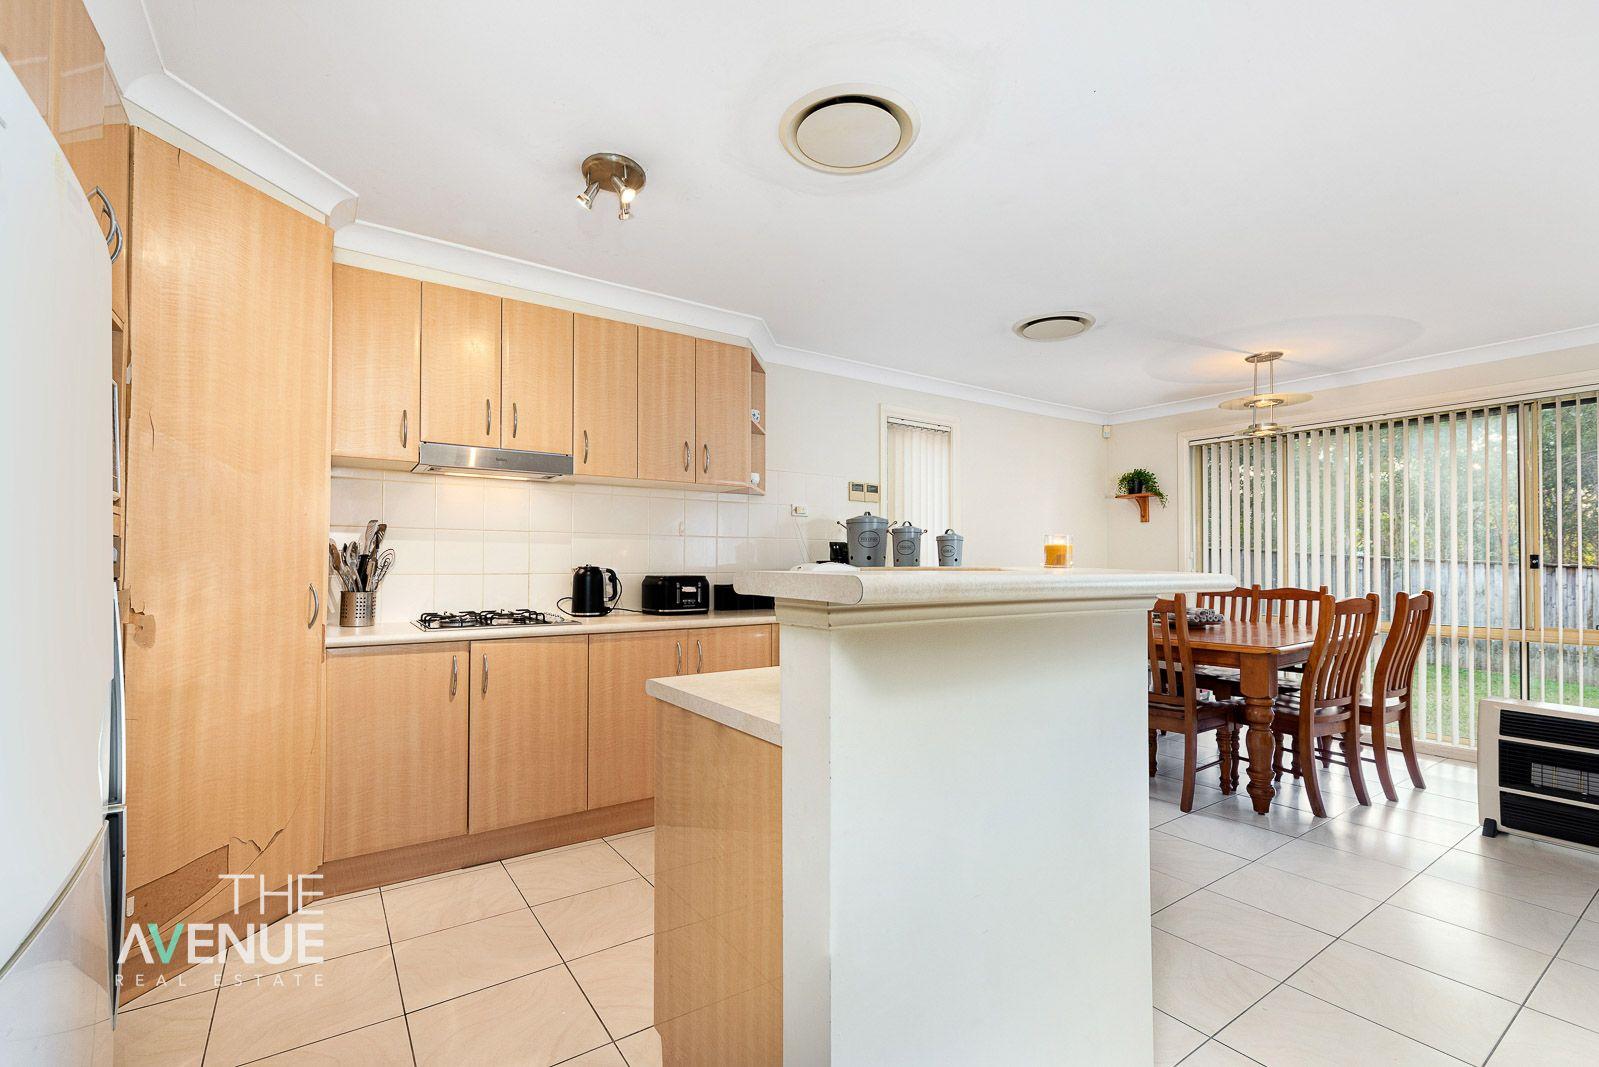 62 Millcroft Way, Beaumont Hills NSW 2155, Image 1